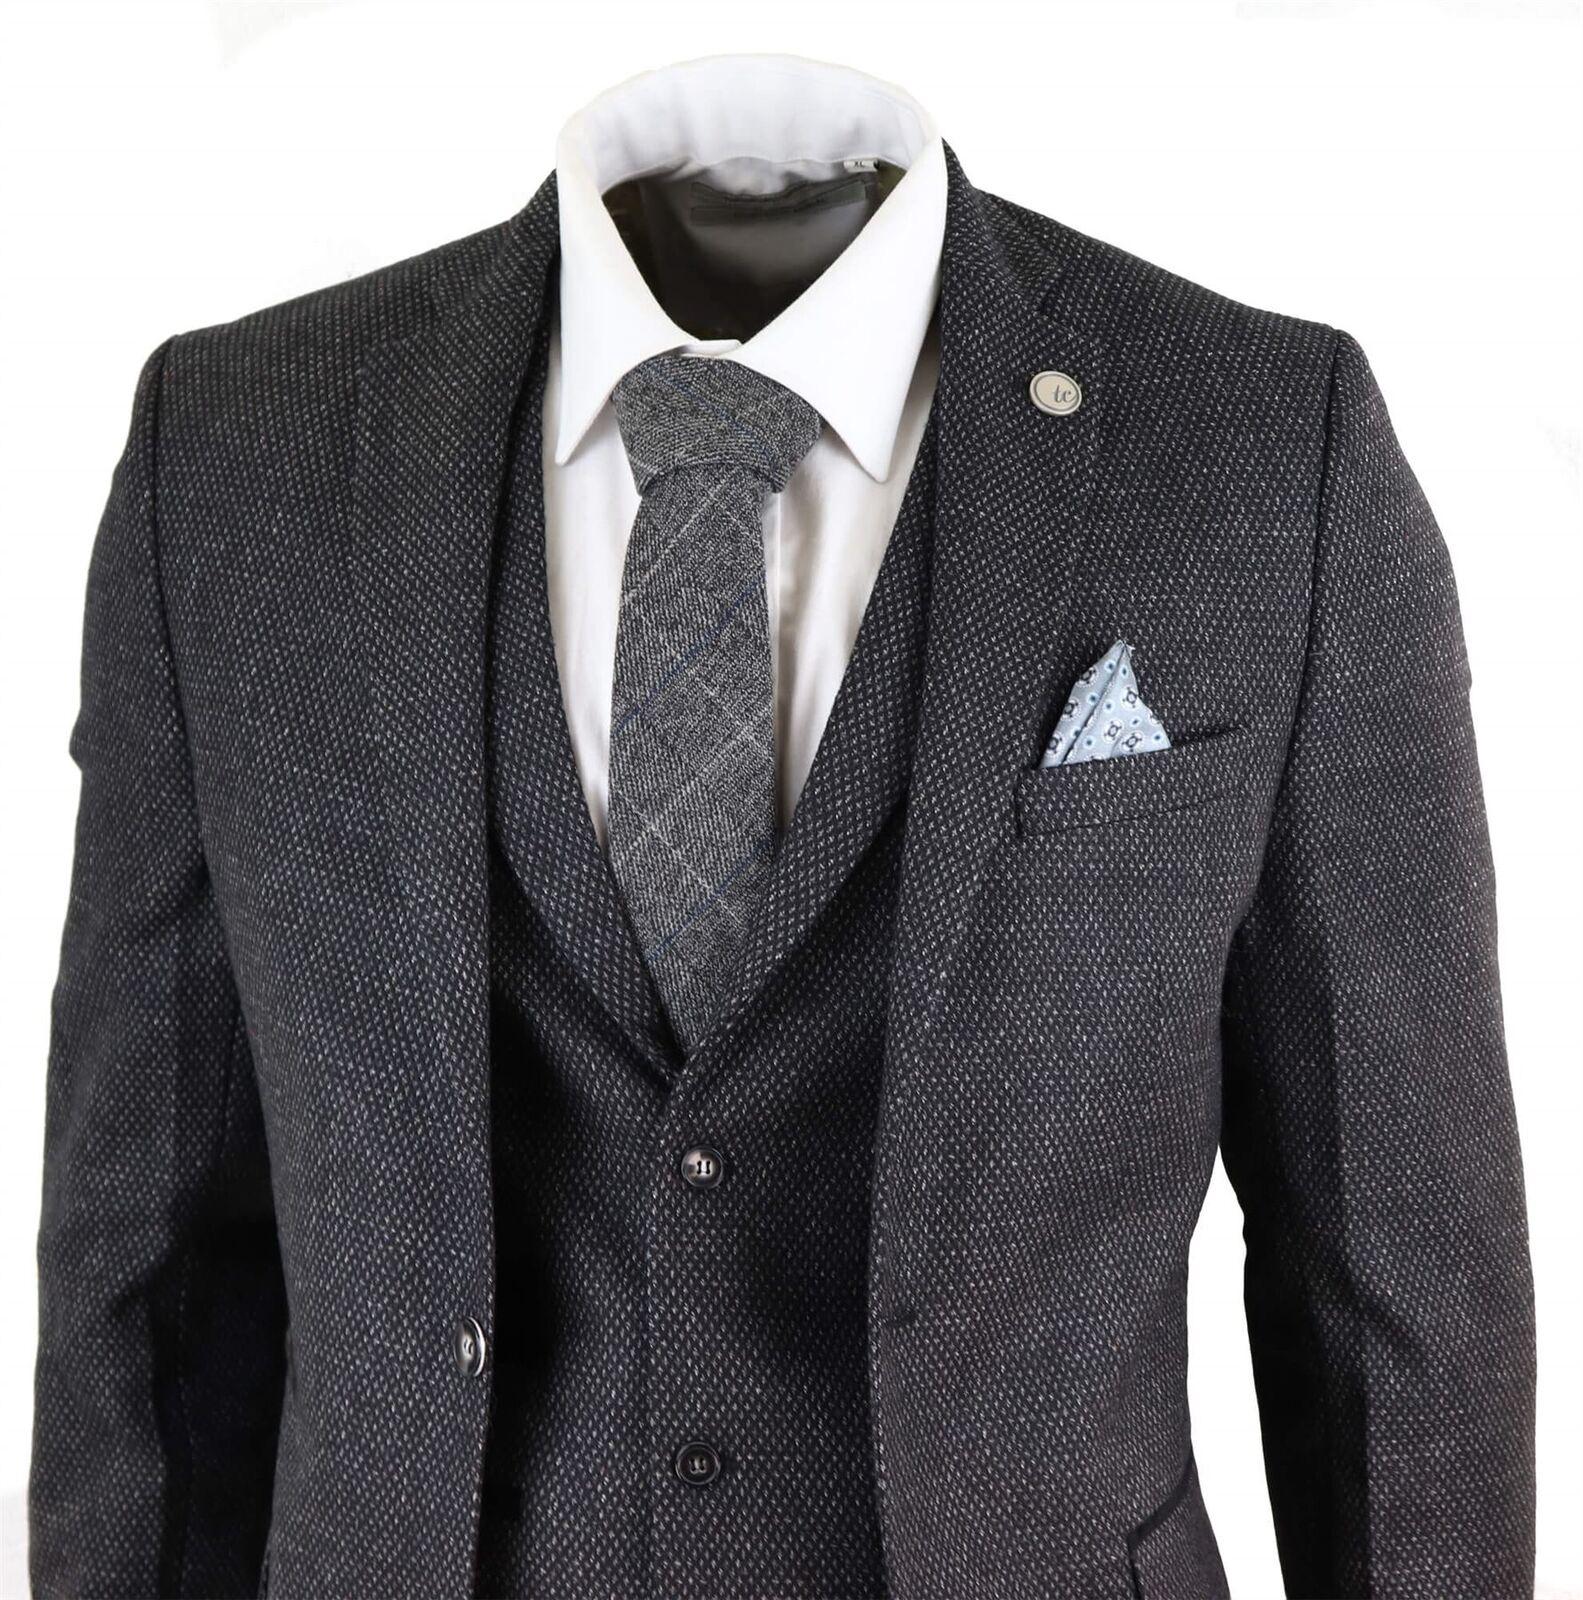 Costume homme laine mélangée 3 pièces tweed anthracite schwarz Peaky Blinders